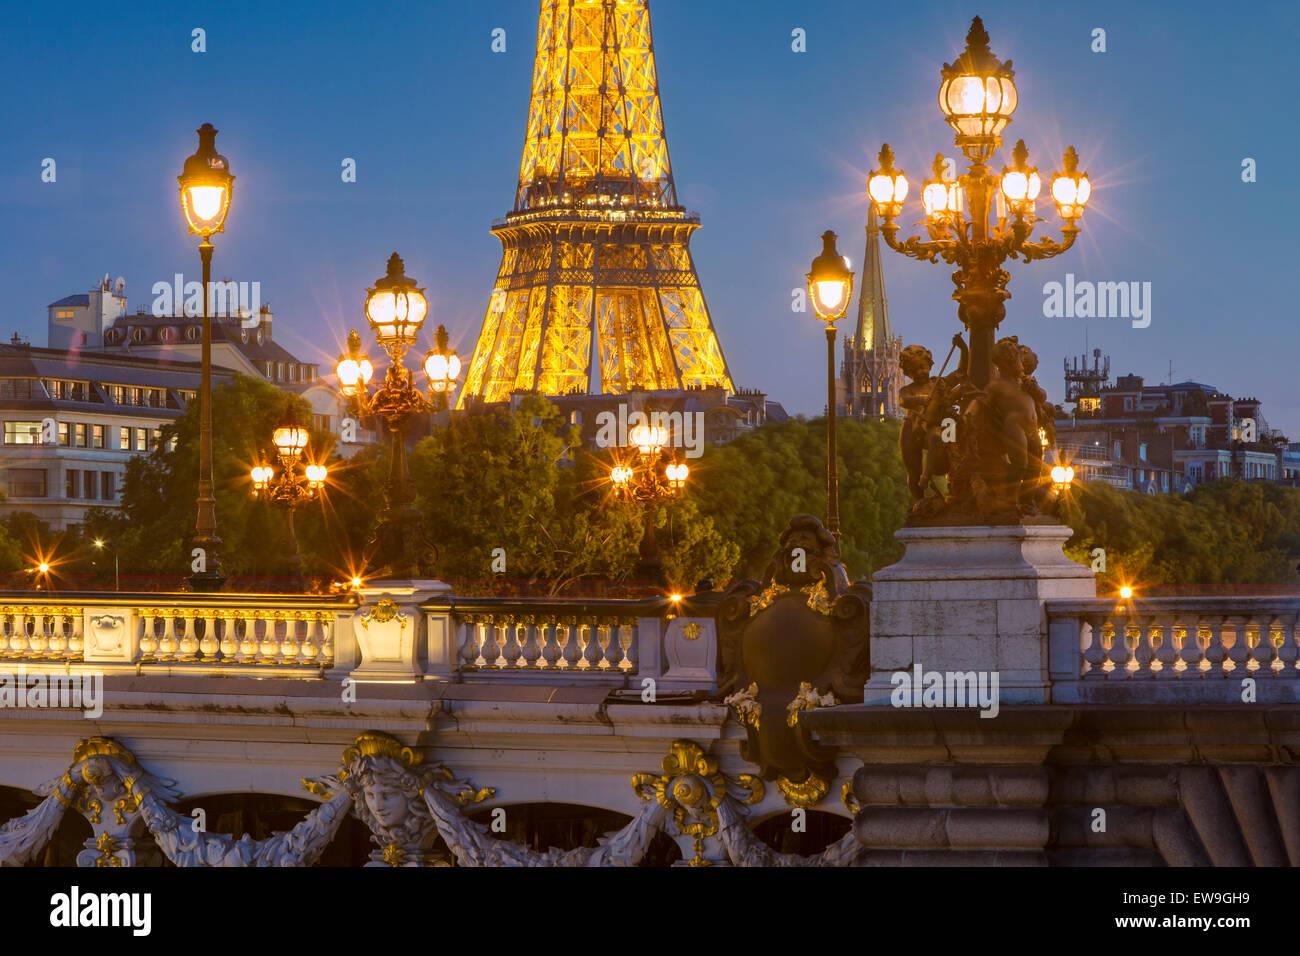 Twilight over lights of Pont Alexandre III with Eiffel Tower beyond, Paris, Ile-de-France, France - Stock Image